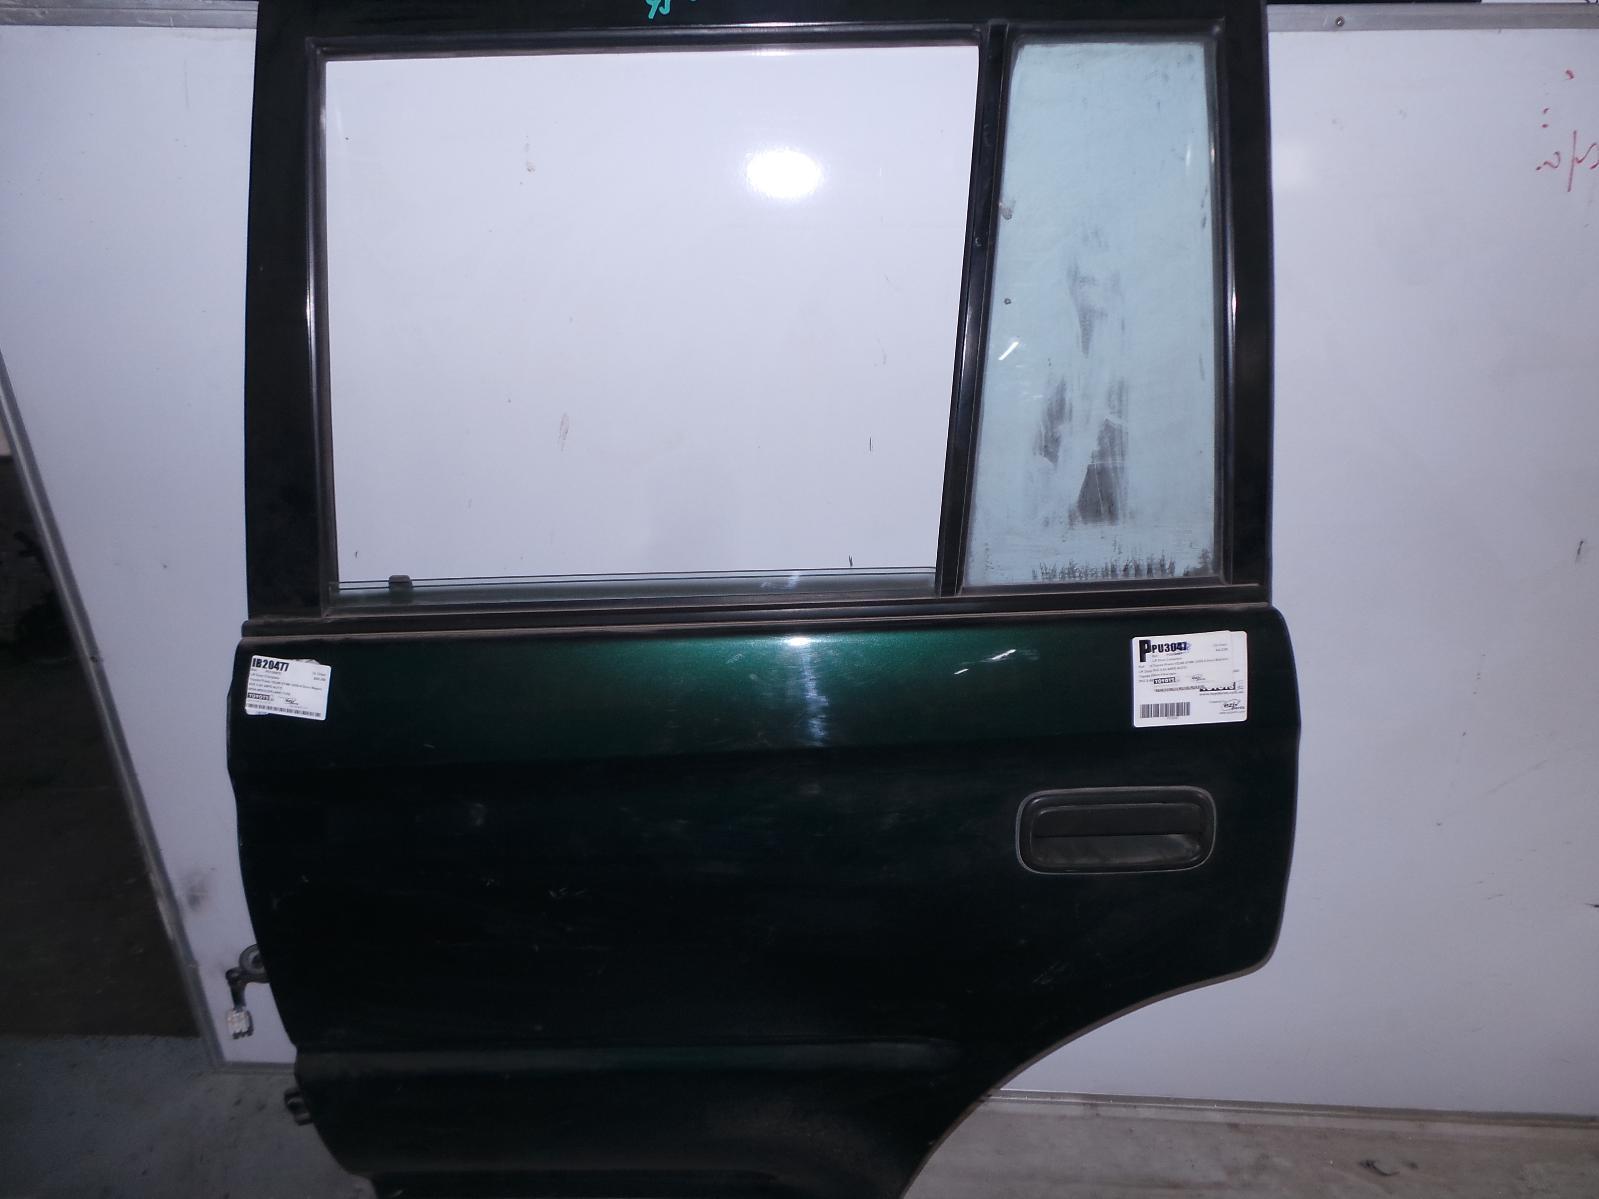 TOYOTA PRADO, Left Rear Door/Sliding, 95 SERIES, NON MOULD TYPE, 07/96-01/03